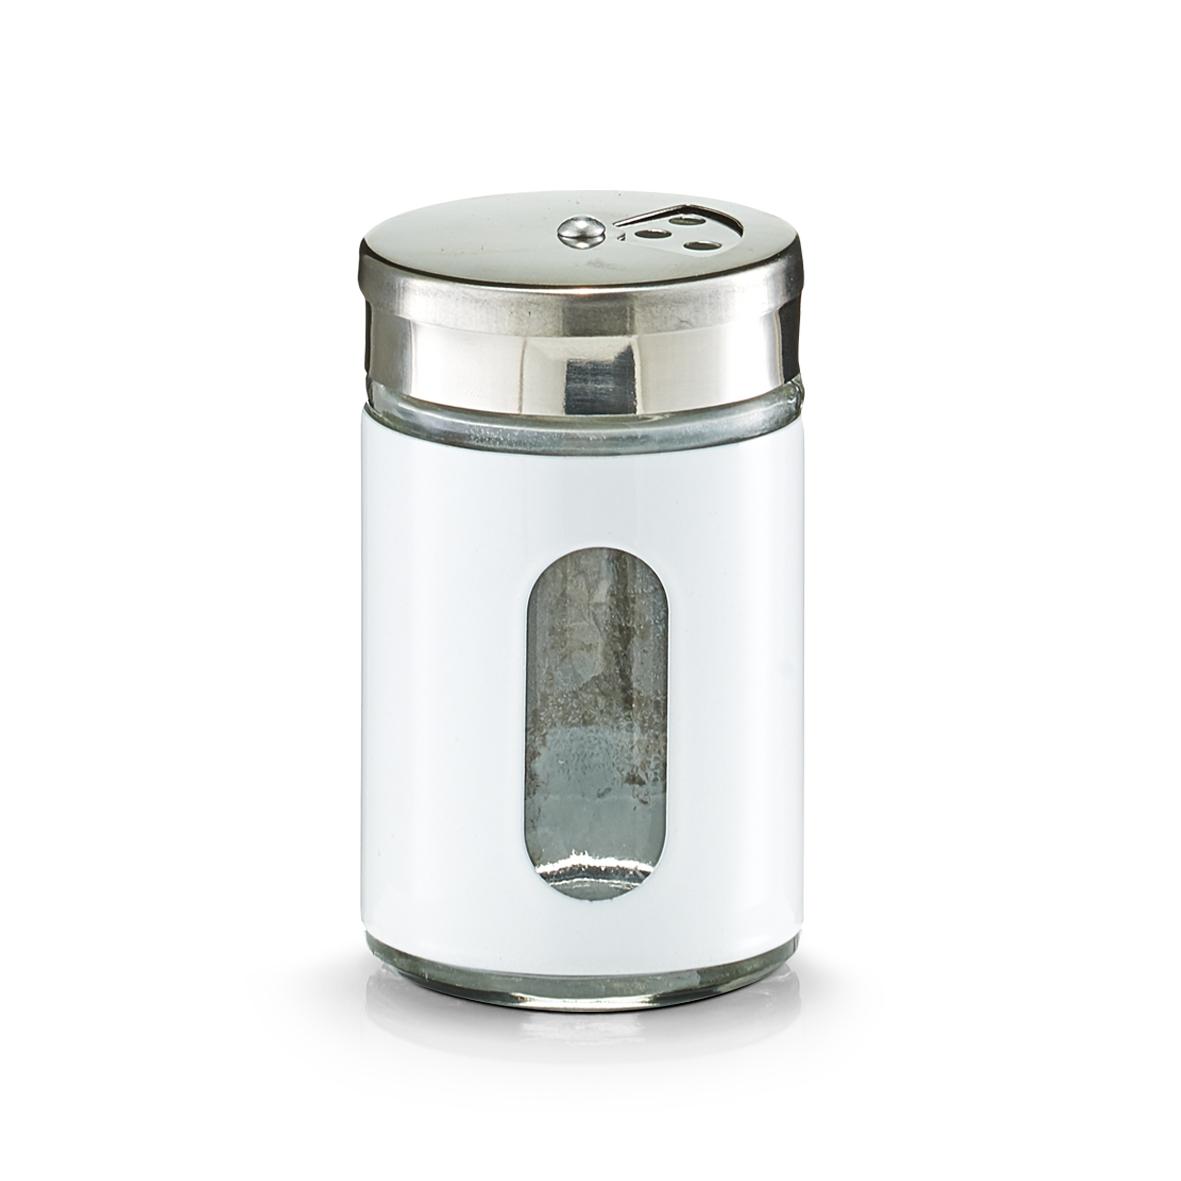 Recipient pentru condimente Visual, inox si sticla, White 90 ml, Ø 5xH8,5 cm imagine